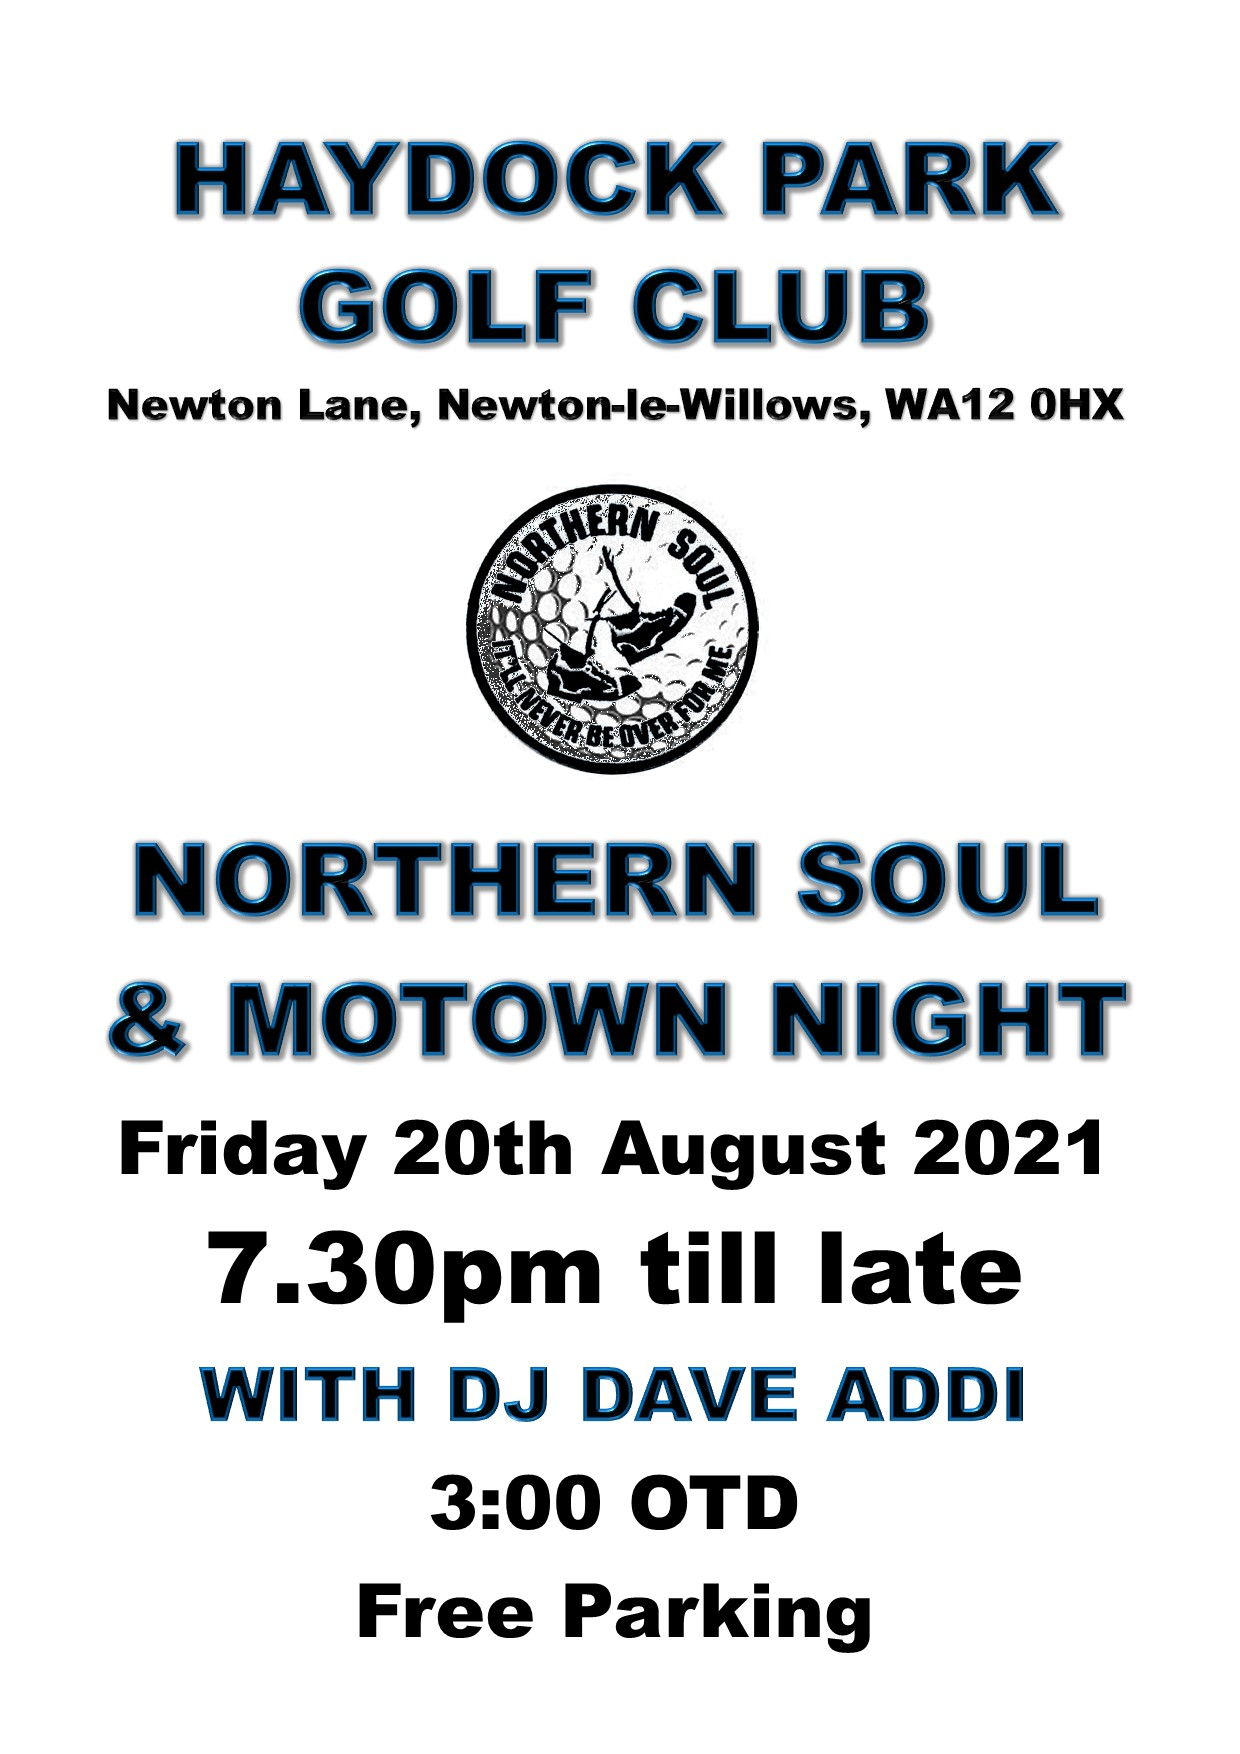 Haydock Park Golf Club Soul Night flyer